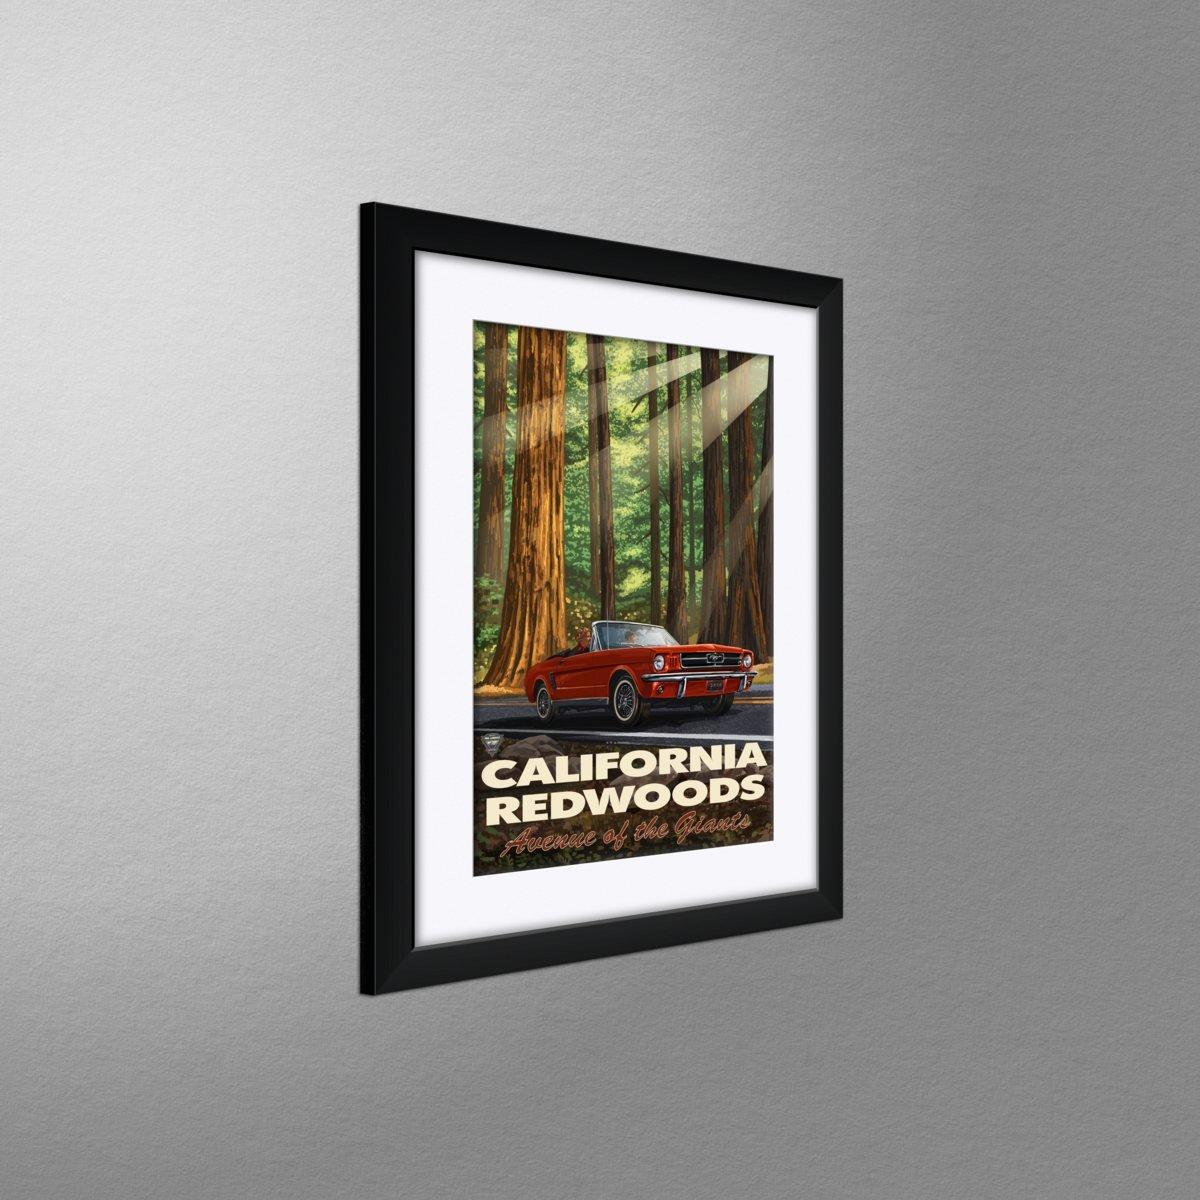 California Redwood Highway Mustang Travel Art Print Poster by Paul A Lanquist 12 x 18